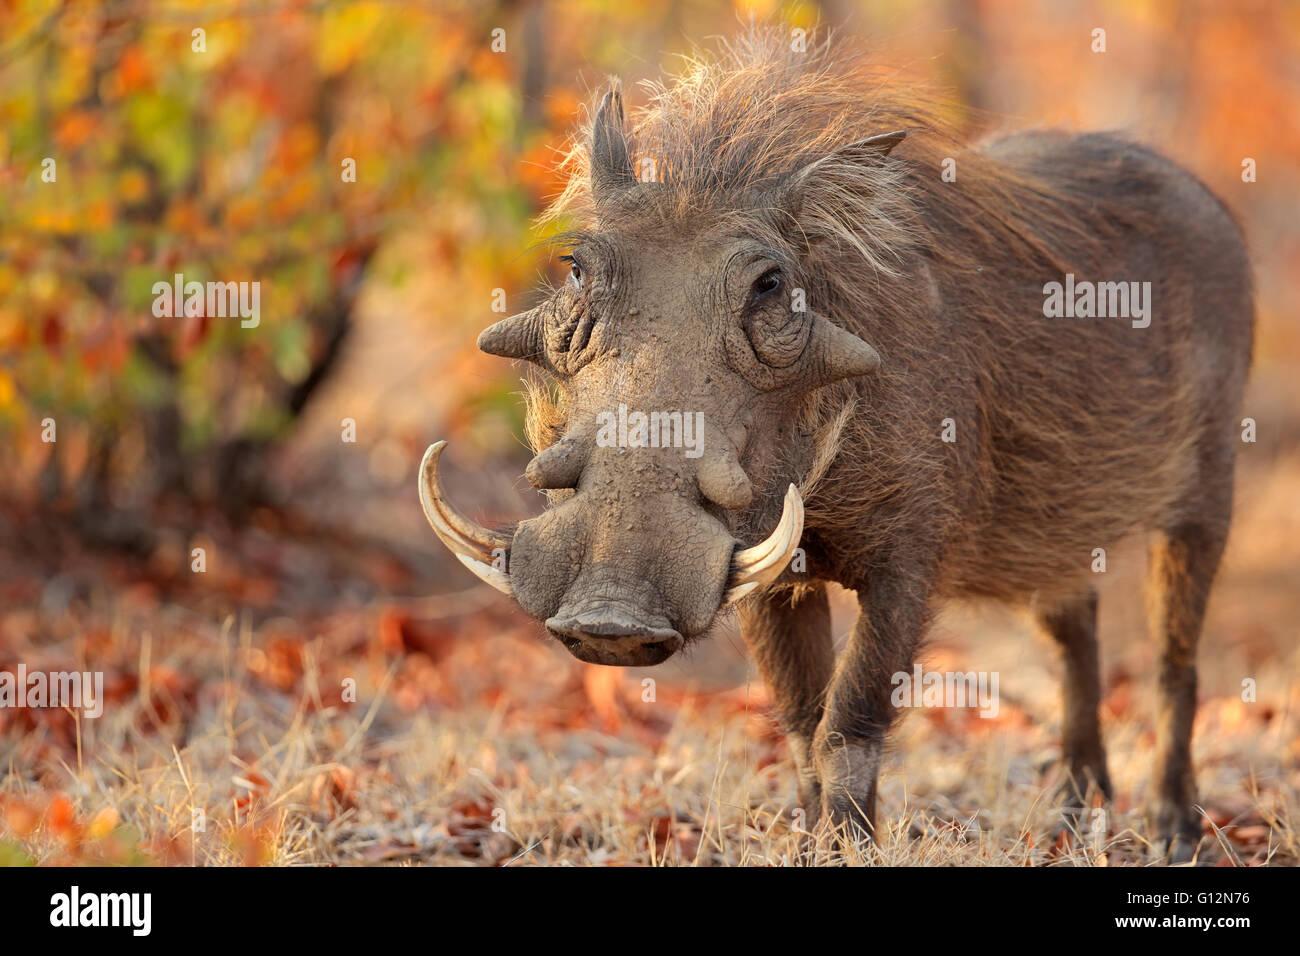 Warthog (Phacochoerus africanus) in natural habitat, Kruger National Park, South Africa - Stock Image